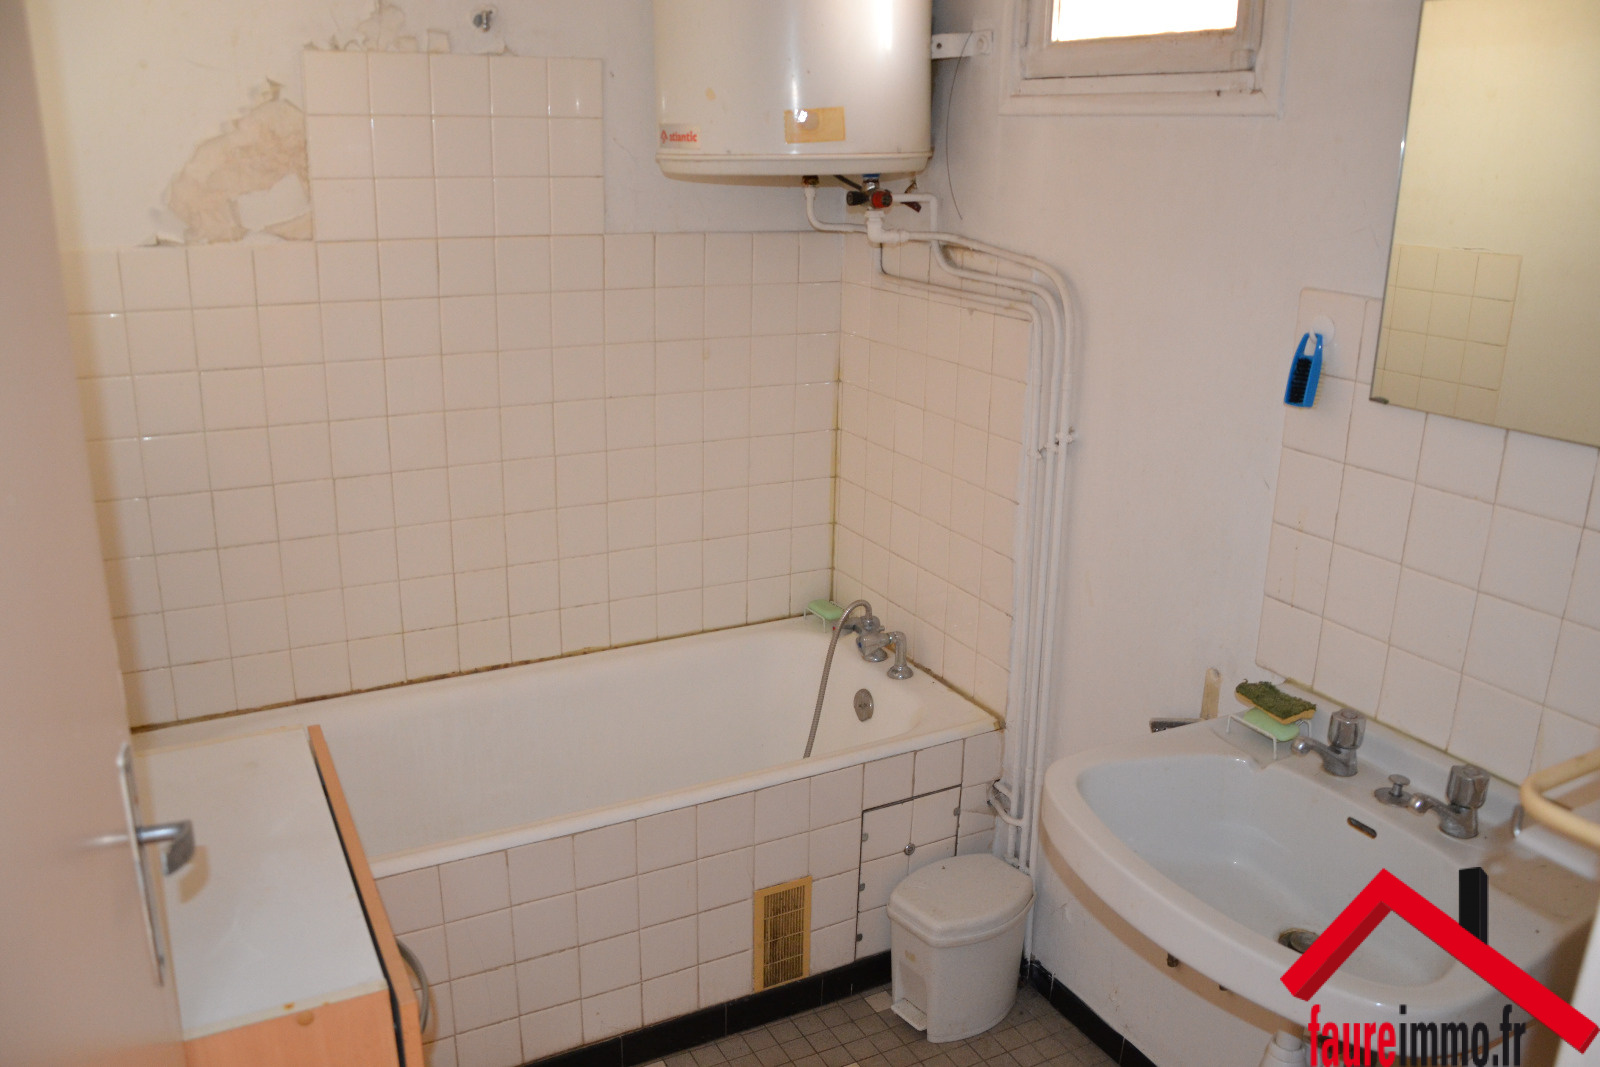 Vente appartement brive la gaillarde avec l 39 agence faure immo for Carrelage brive la gaillarde